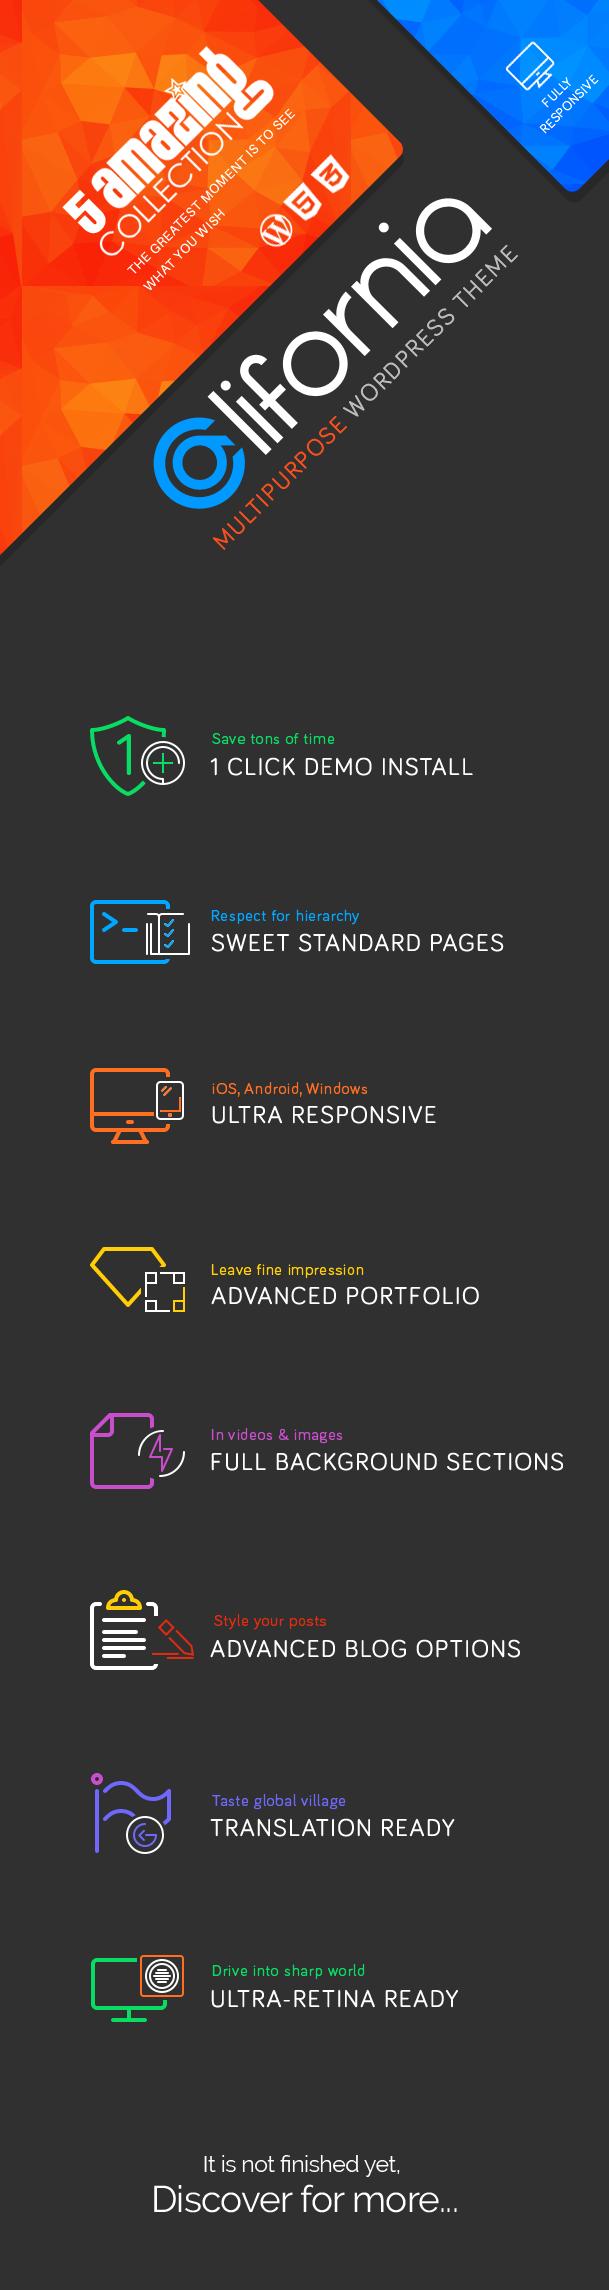 California - Multipurpose WordPress Theme 2